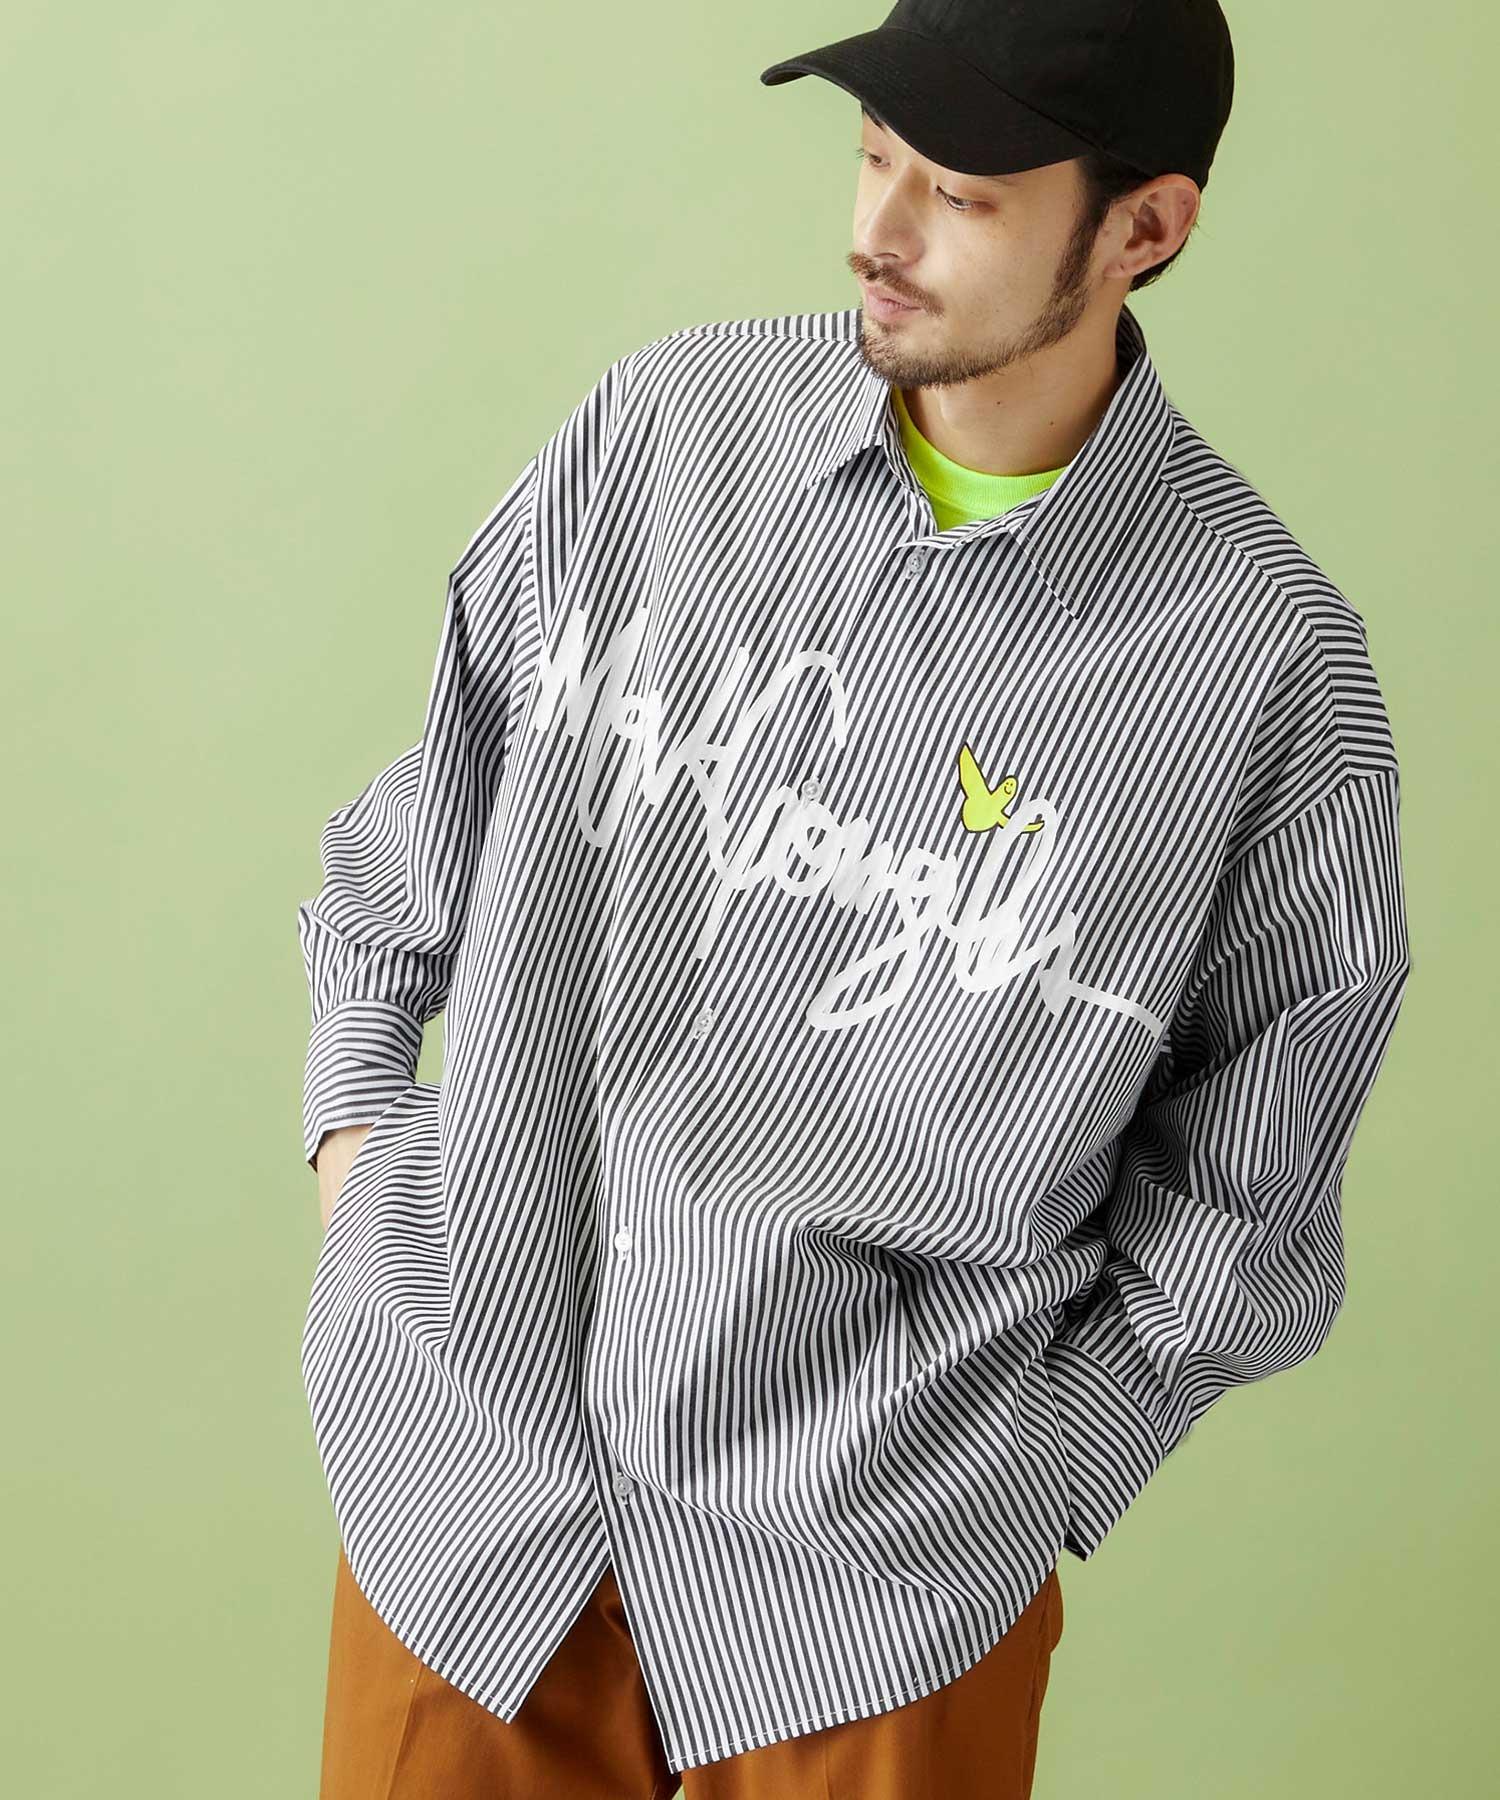 Mark Gonzales/マークゴンザレス MONO-MART別注 ロゴプリント オーバーサイズ ストライプシャツ